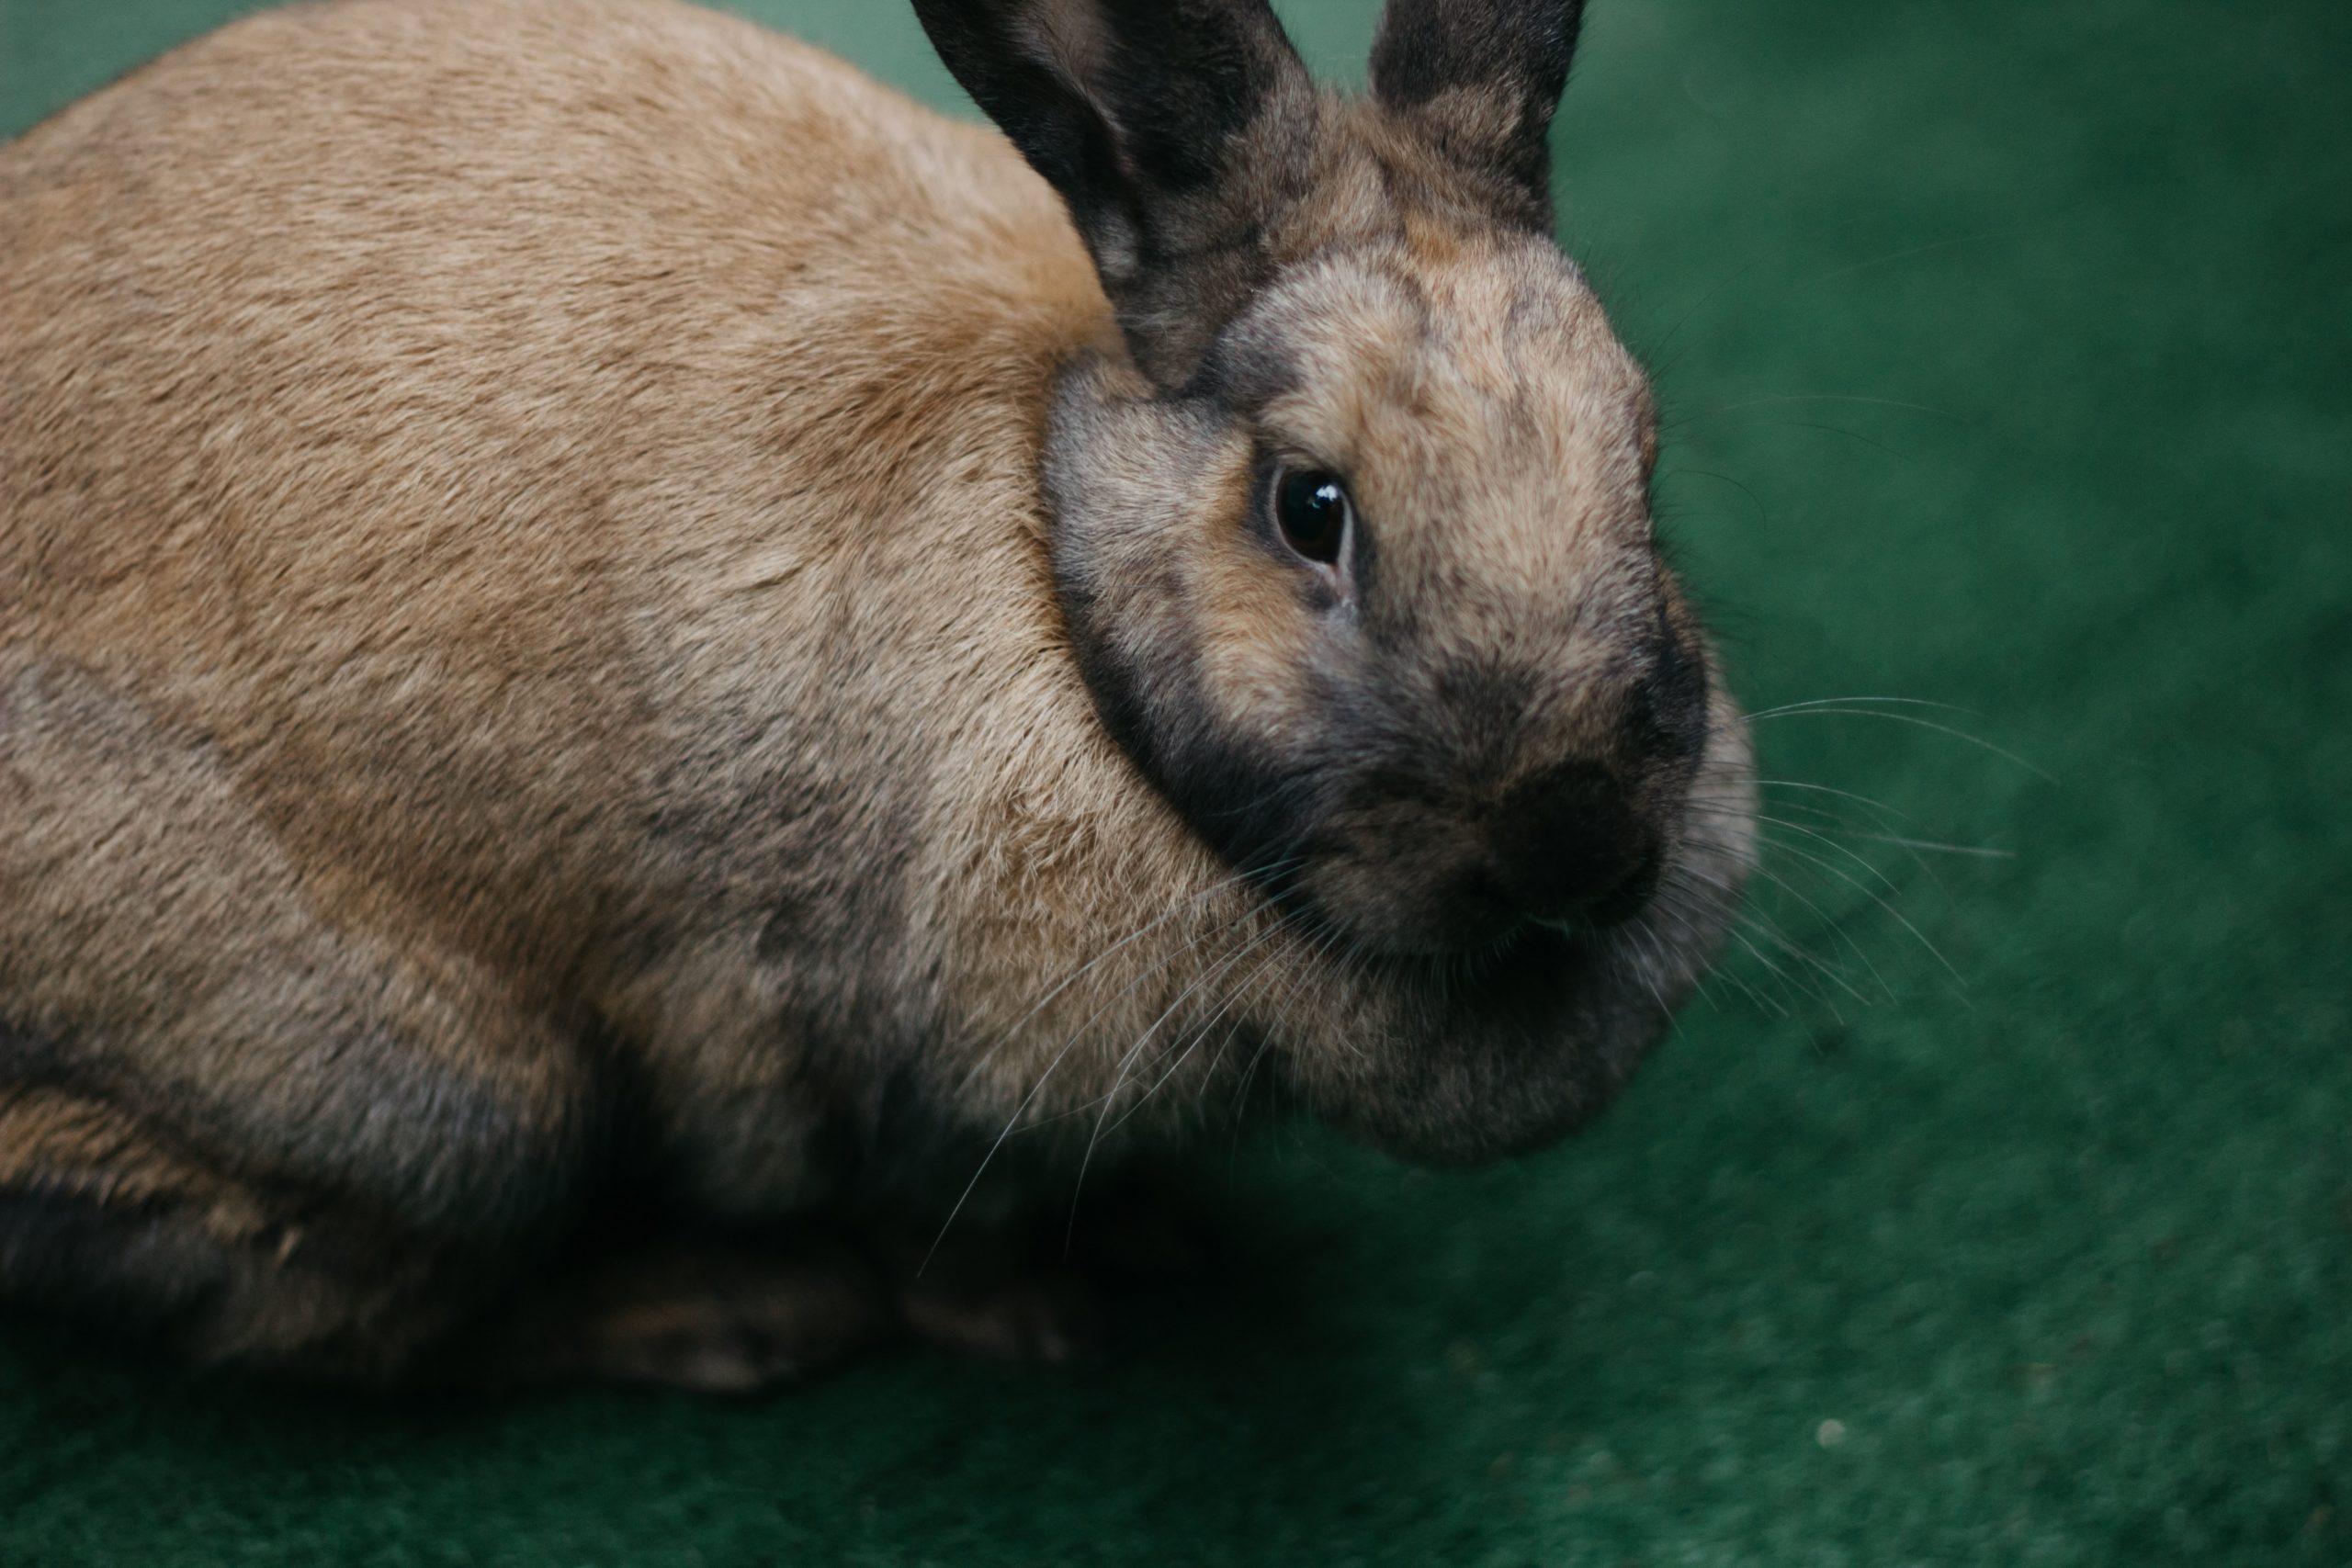 Rabbit Pregnancy